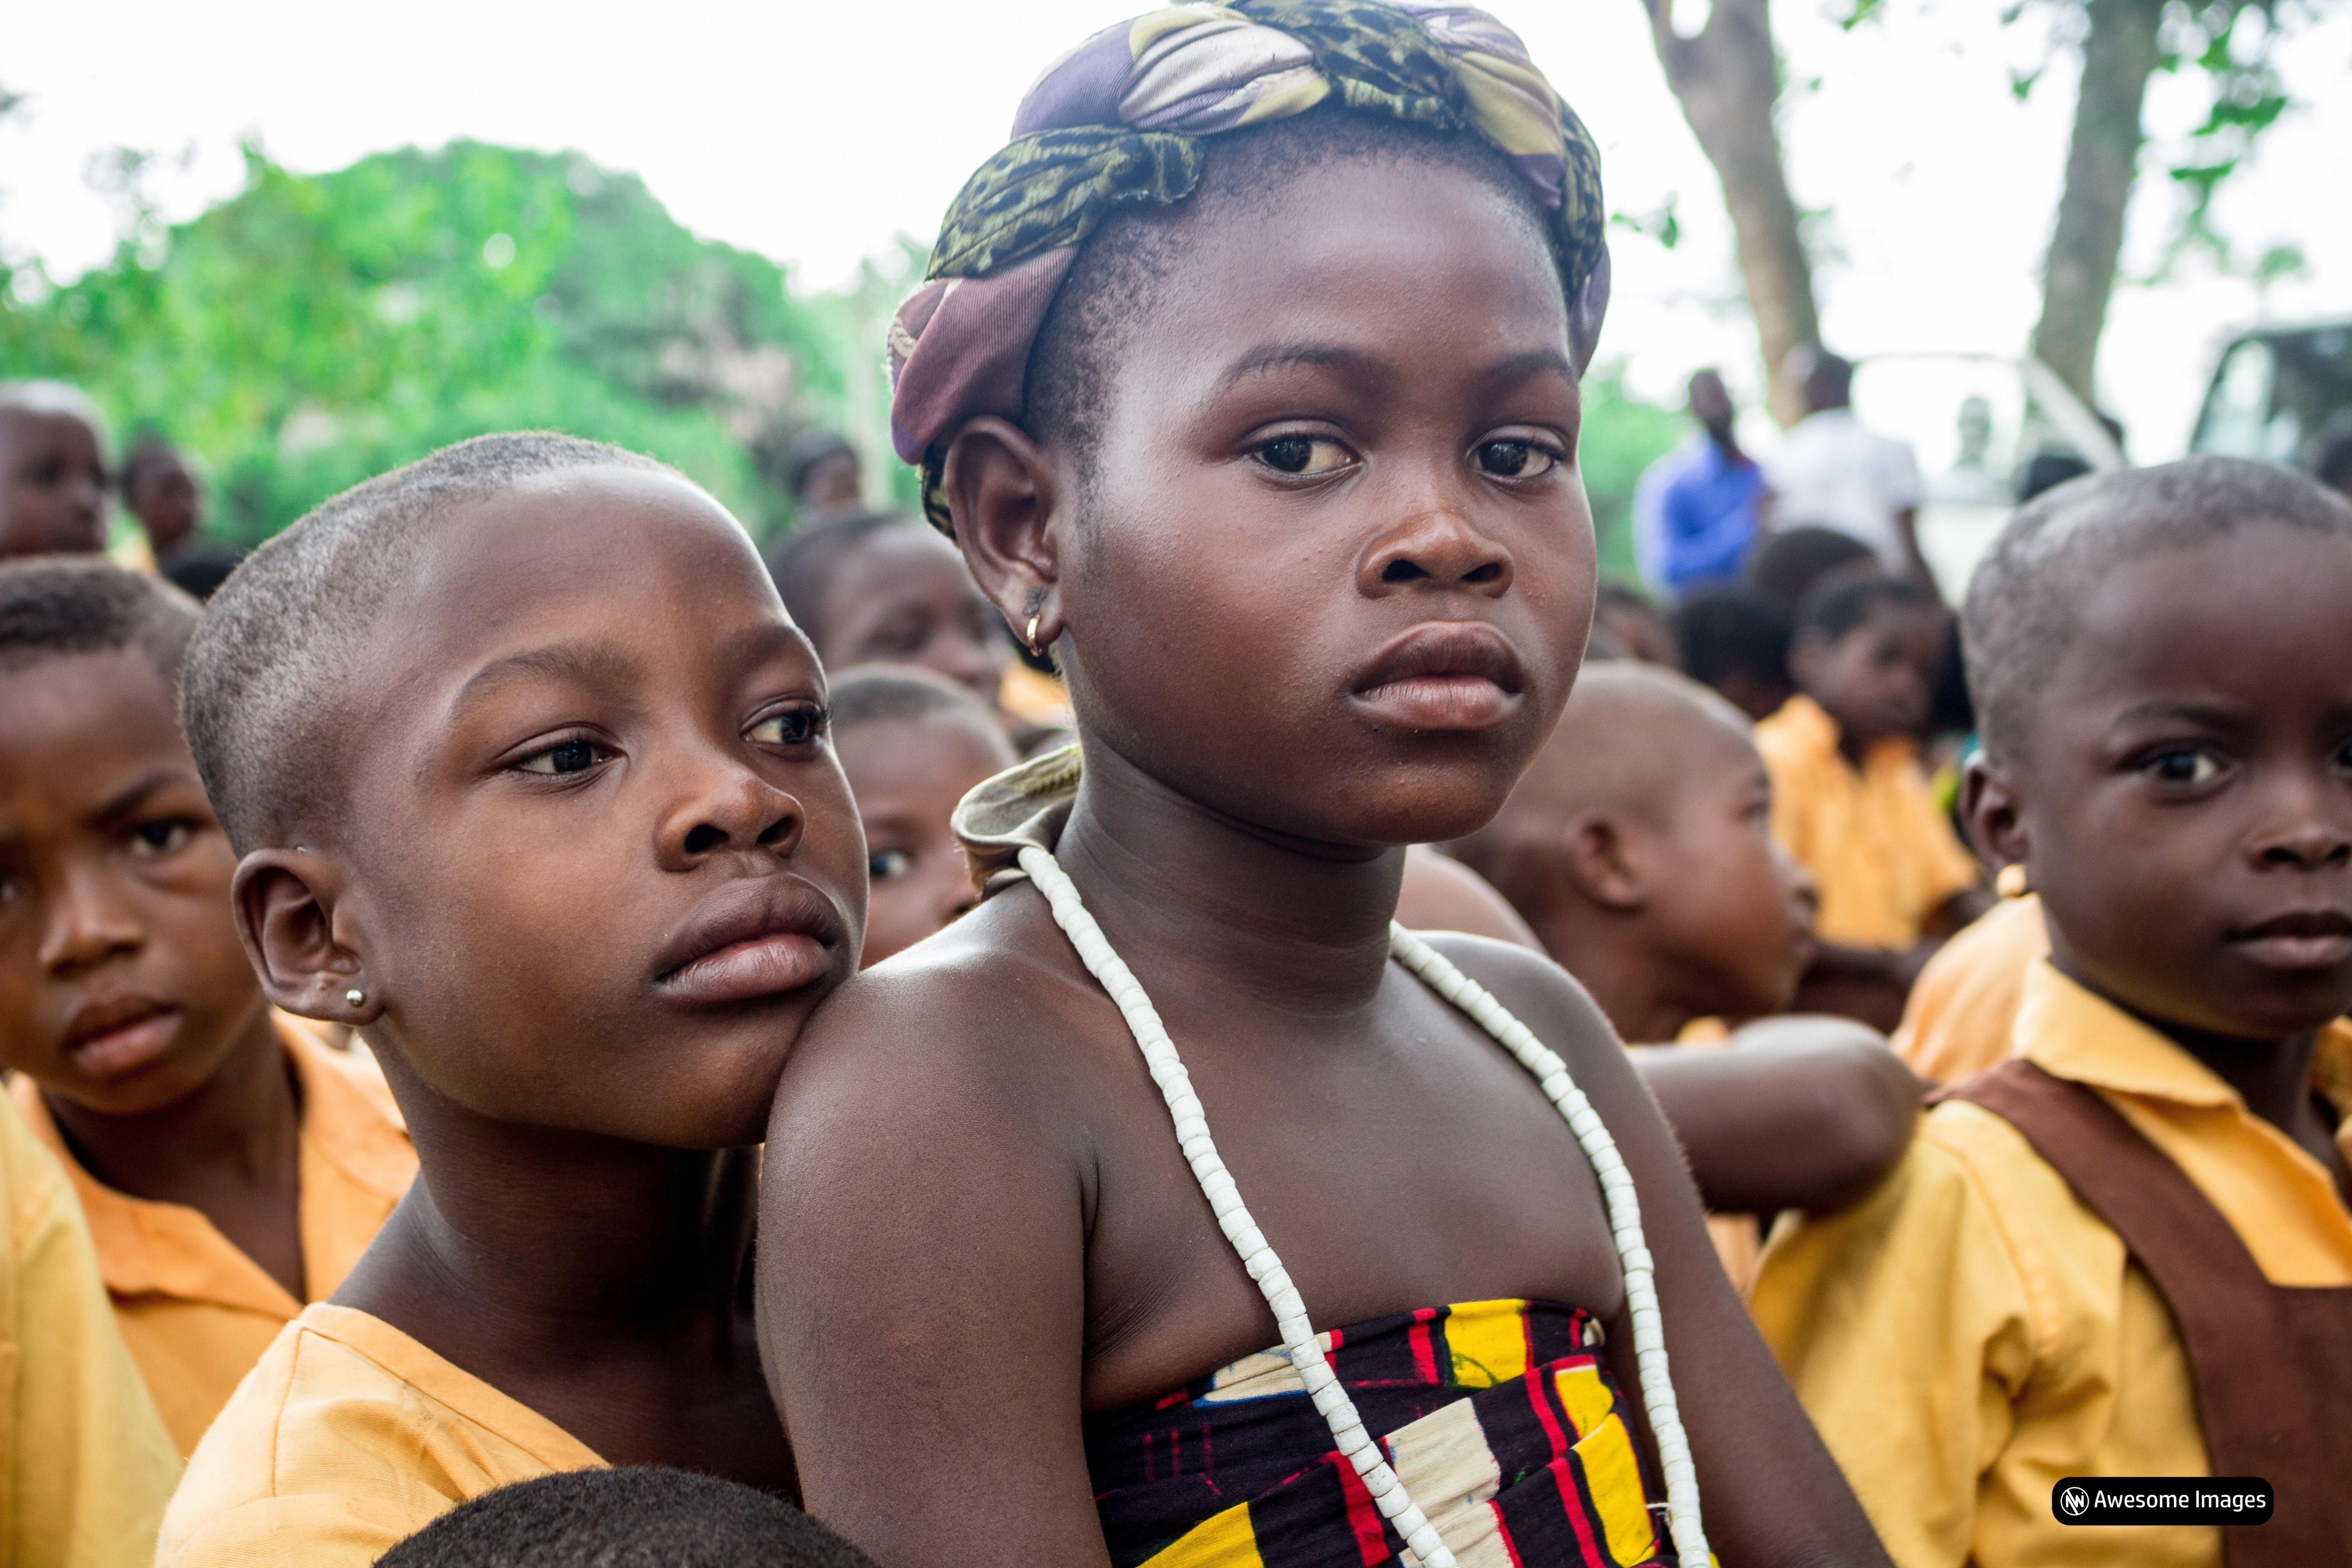 US issues visa ban against Ghana — Quartz Africa